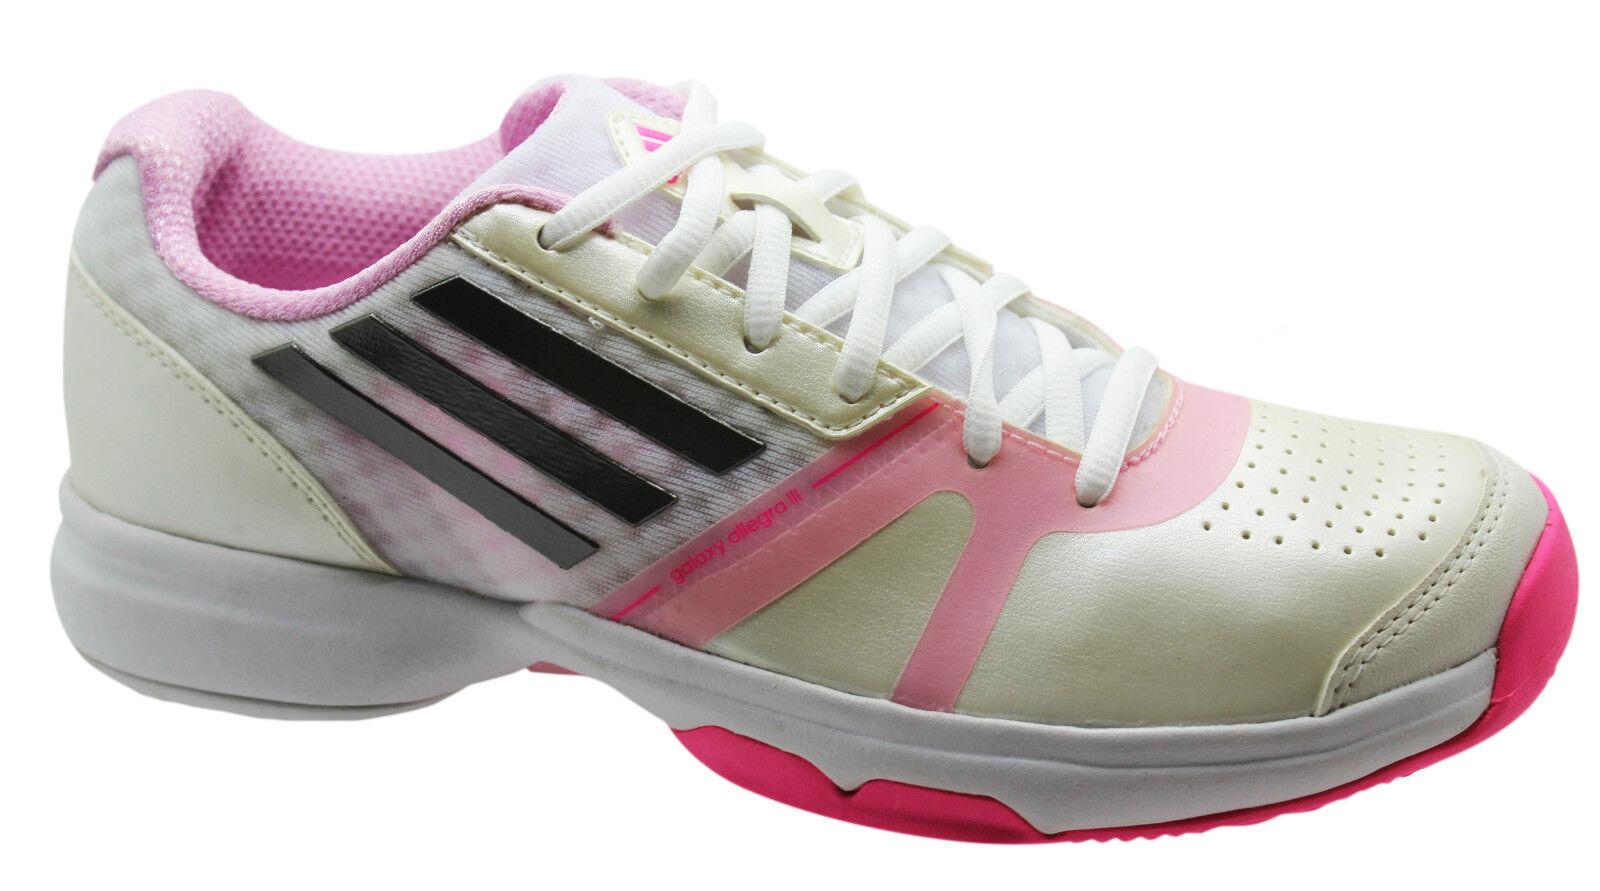 Adidas Sports Galaxy Allegra III Womens Trainers Tennis Tennis Tennis shoes Lace Up M19766 U39 b1c366